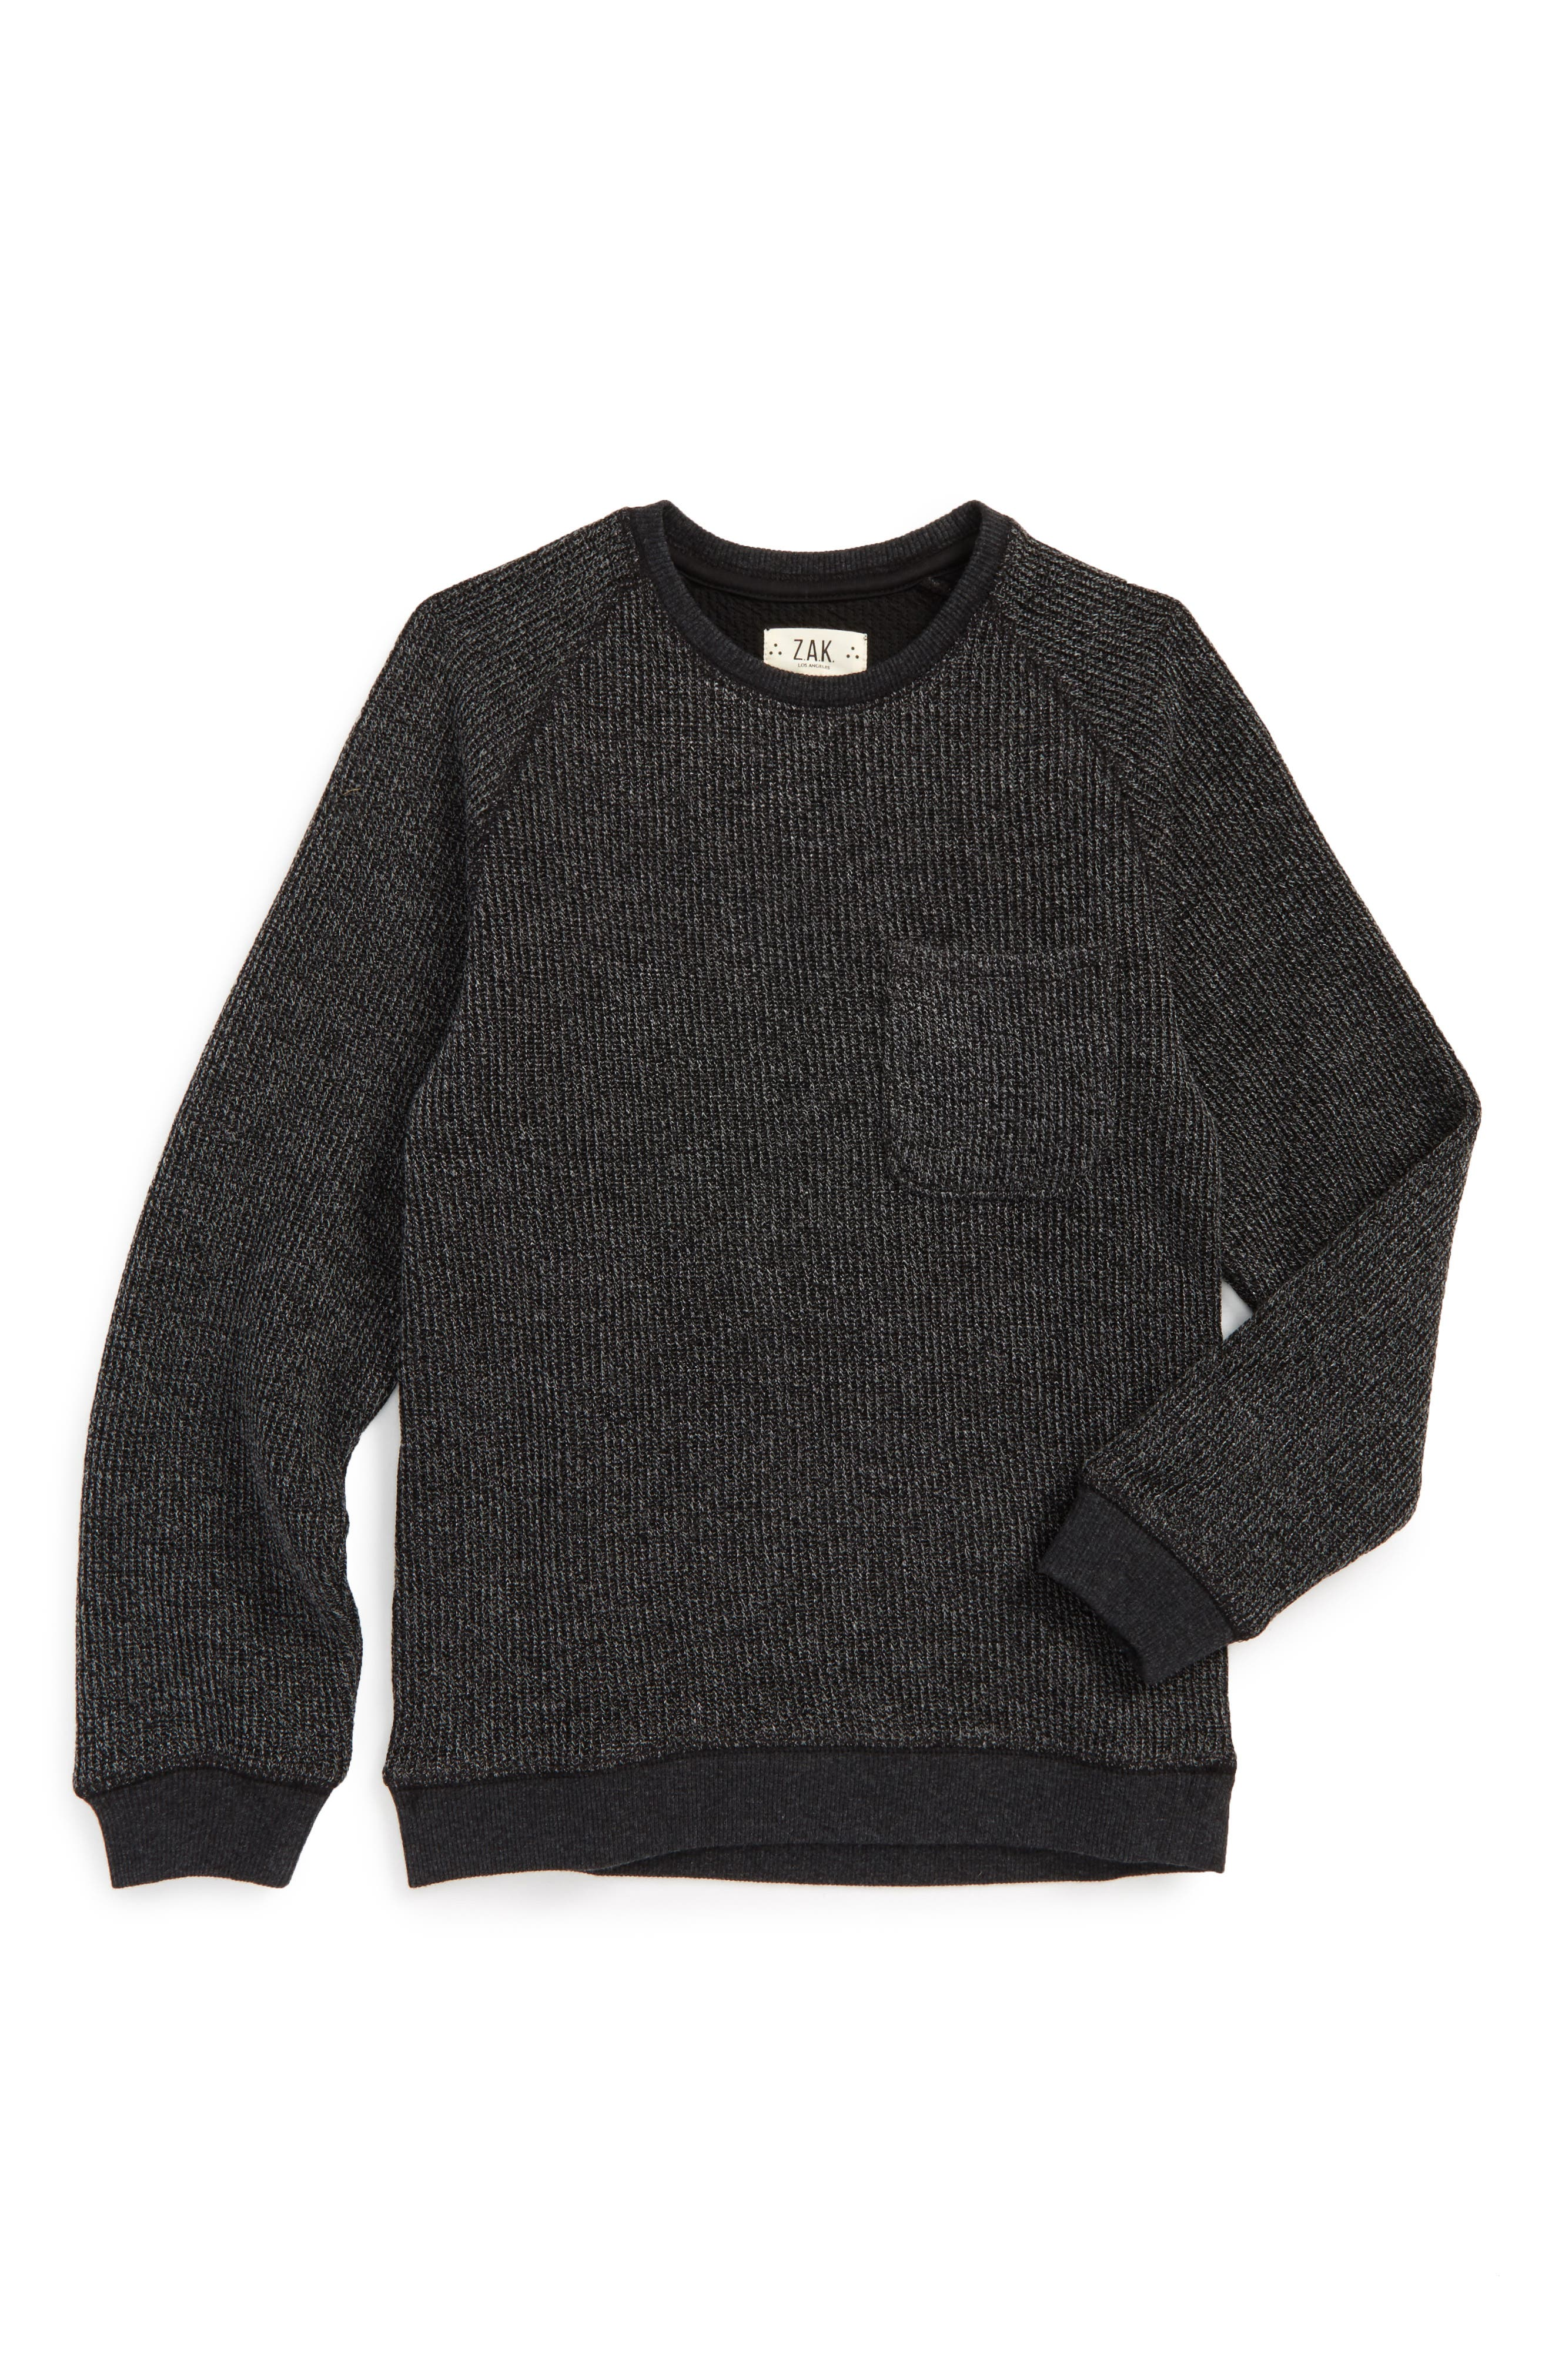 Raglan Pocket Sweater,                             Main thumbnail 1, color,                             001